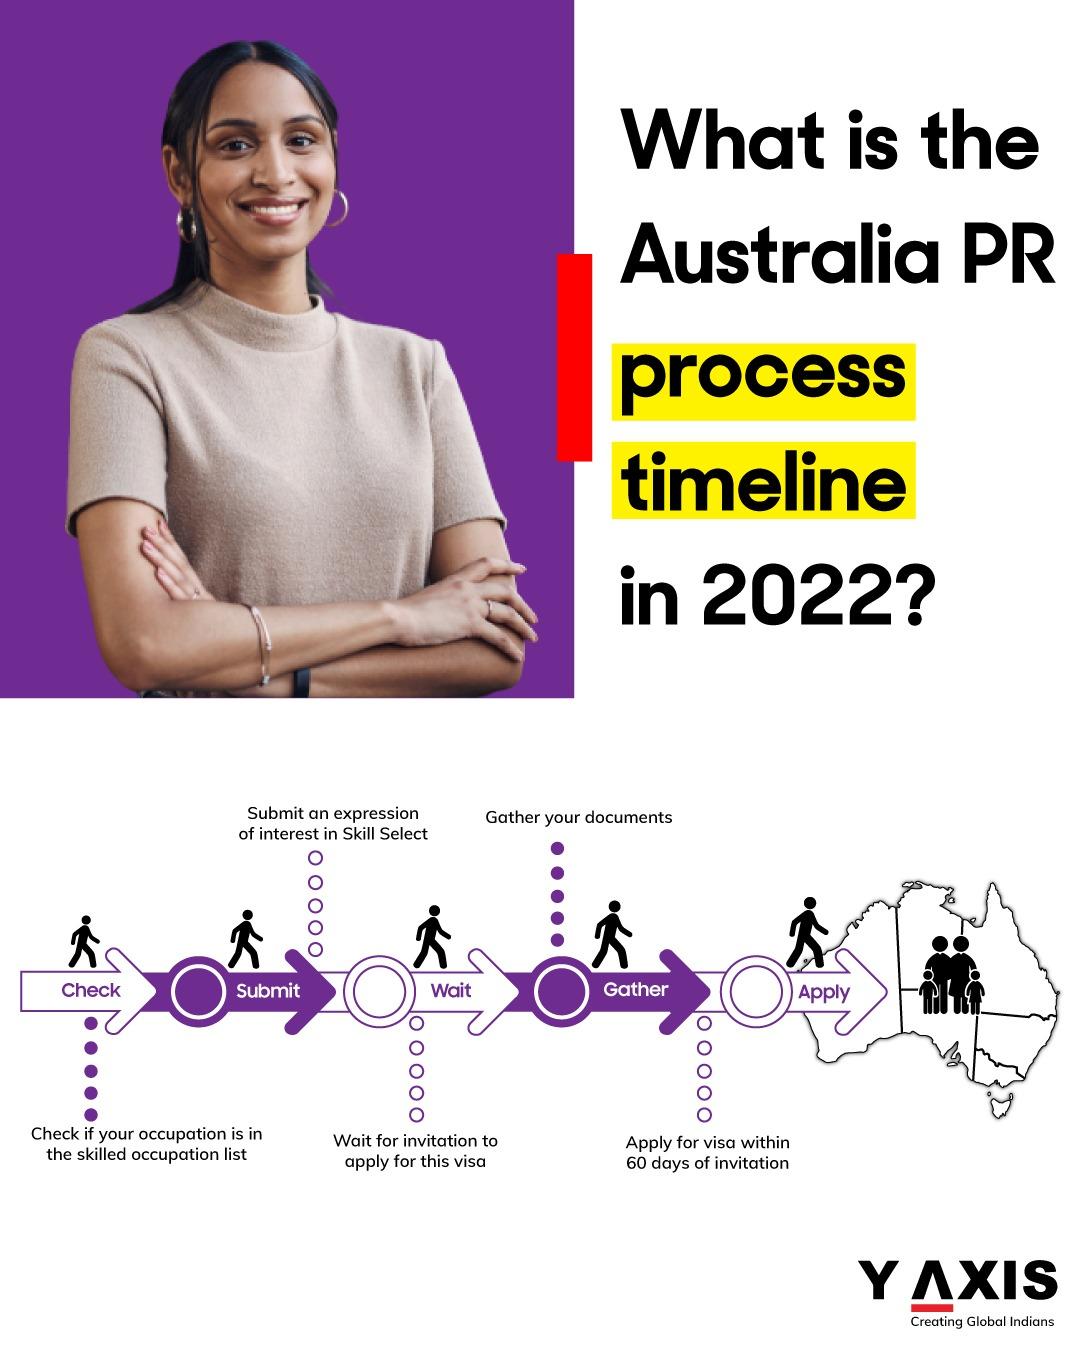 Australia immigration basics - The timeline for Australia PR process